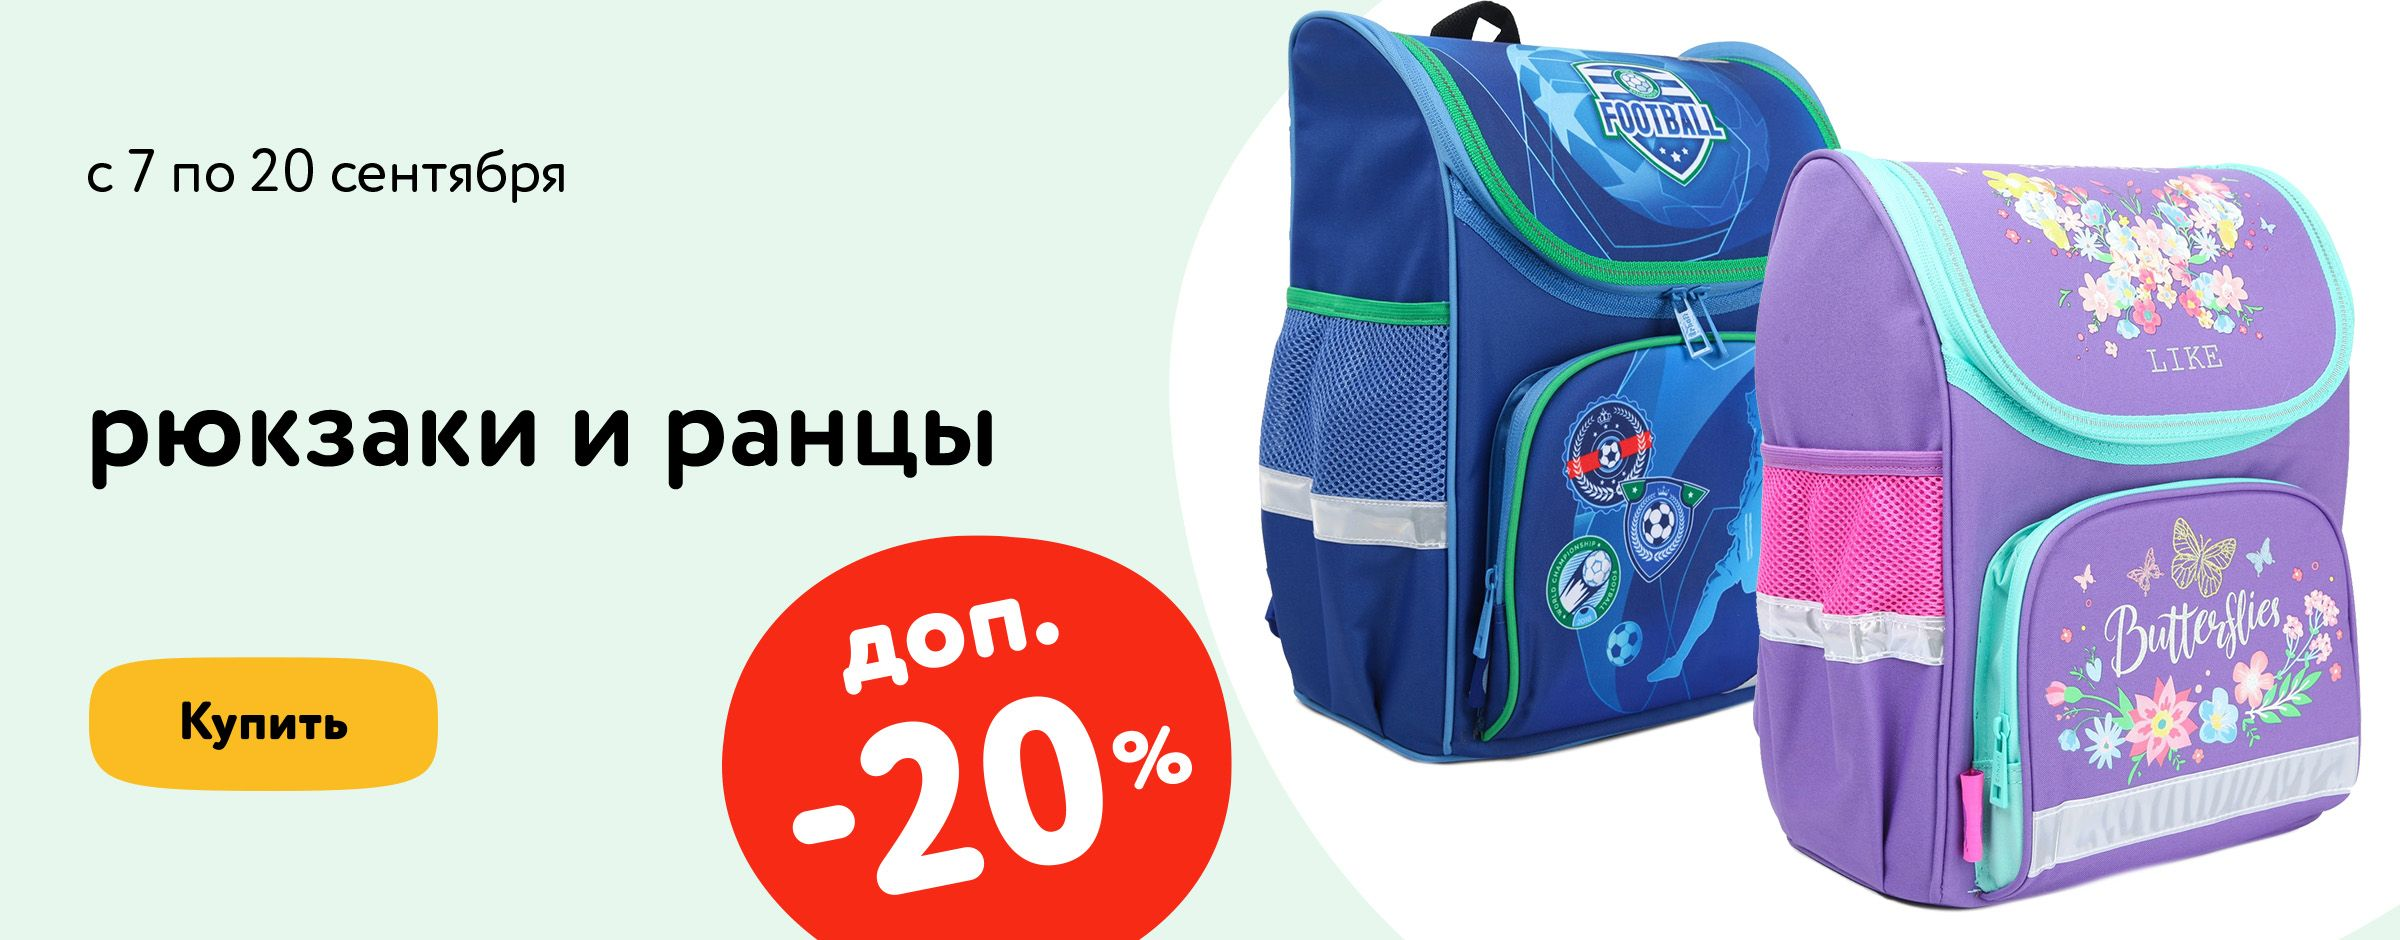 Доп. 20% на рюкзаки и ранцы Школа